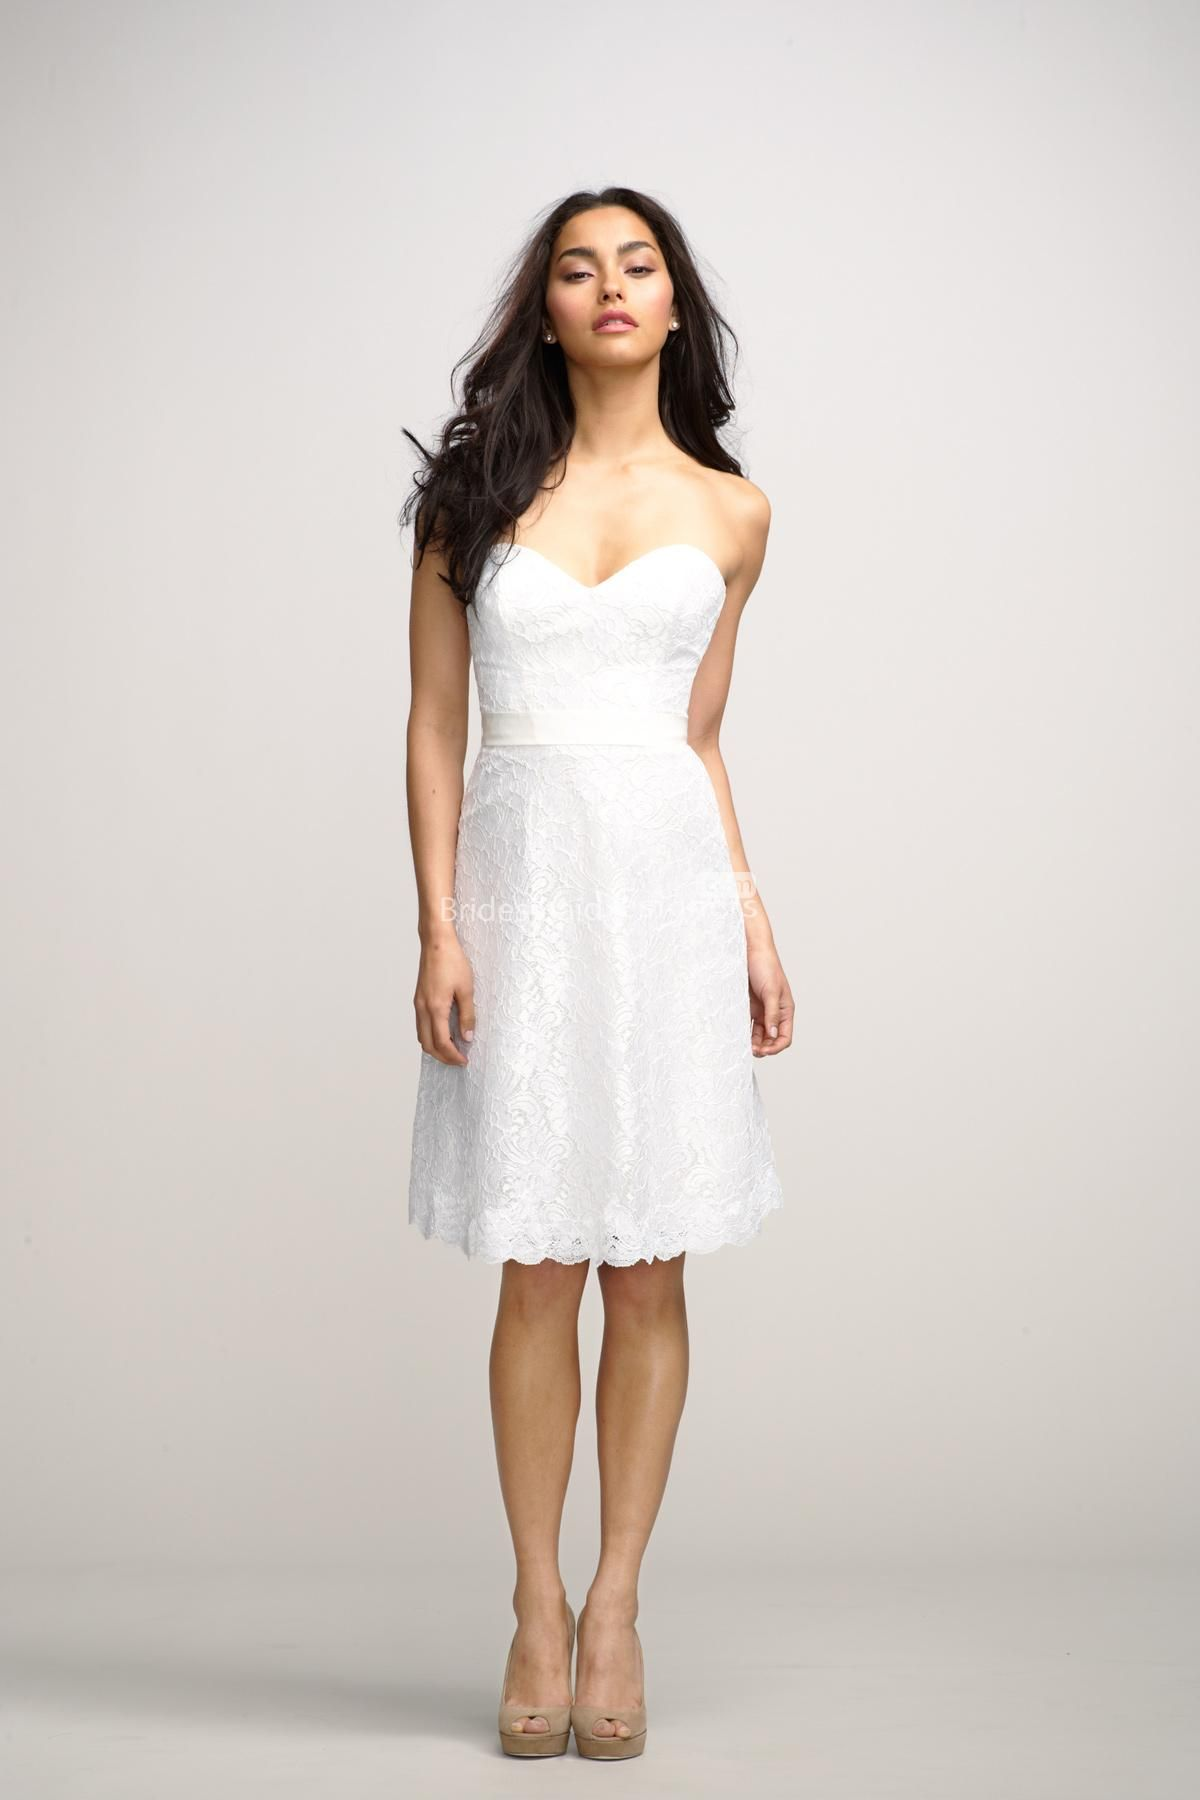 Mini white wedding dress  little white strapless sweetheart short mini lace bridal rehearsal